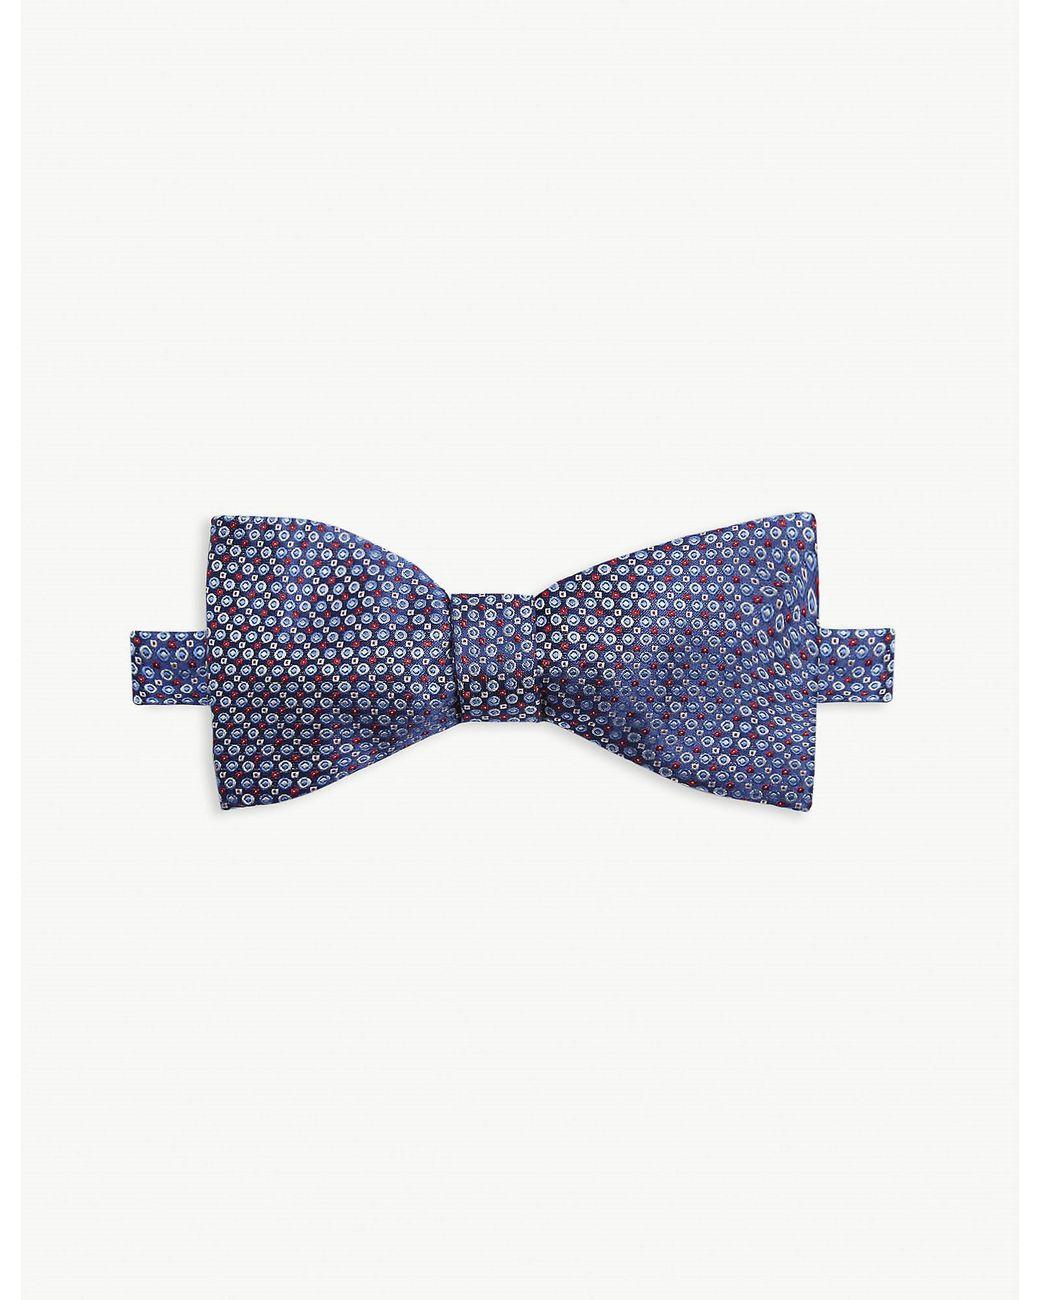 Cufflinks /& Pocket Hanky Gift Box Steel Grey Polka Dot Mens Satin Bow Tie